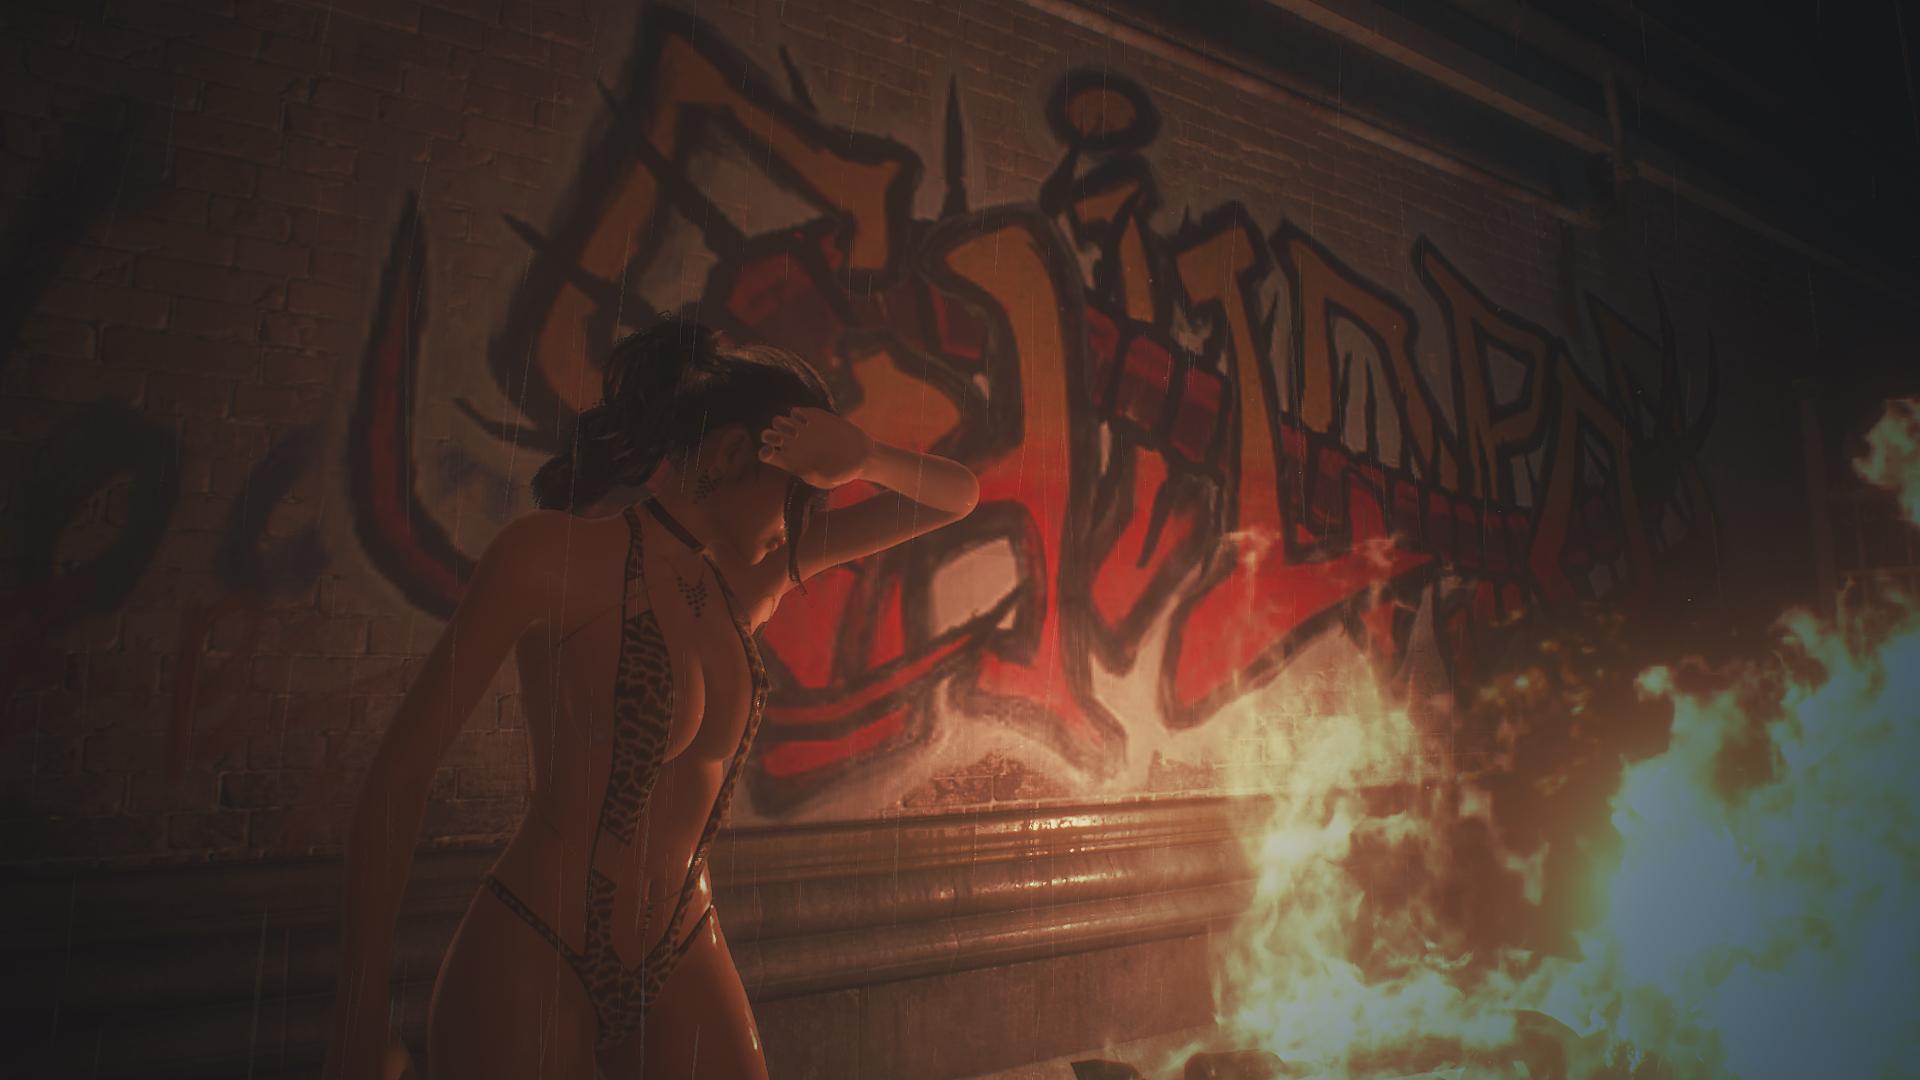 Scallop - Resident Evil 2